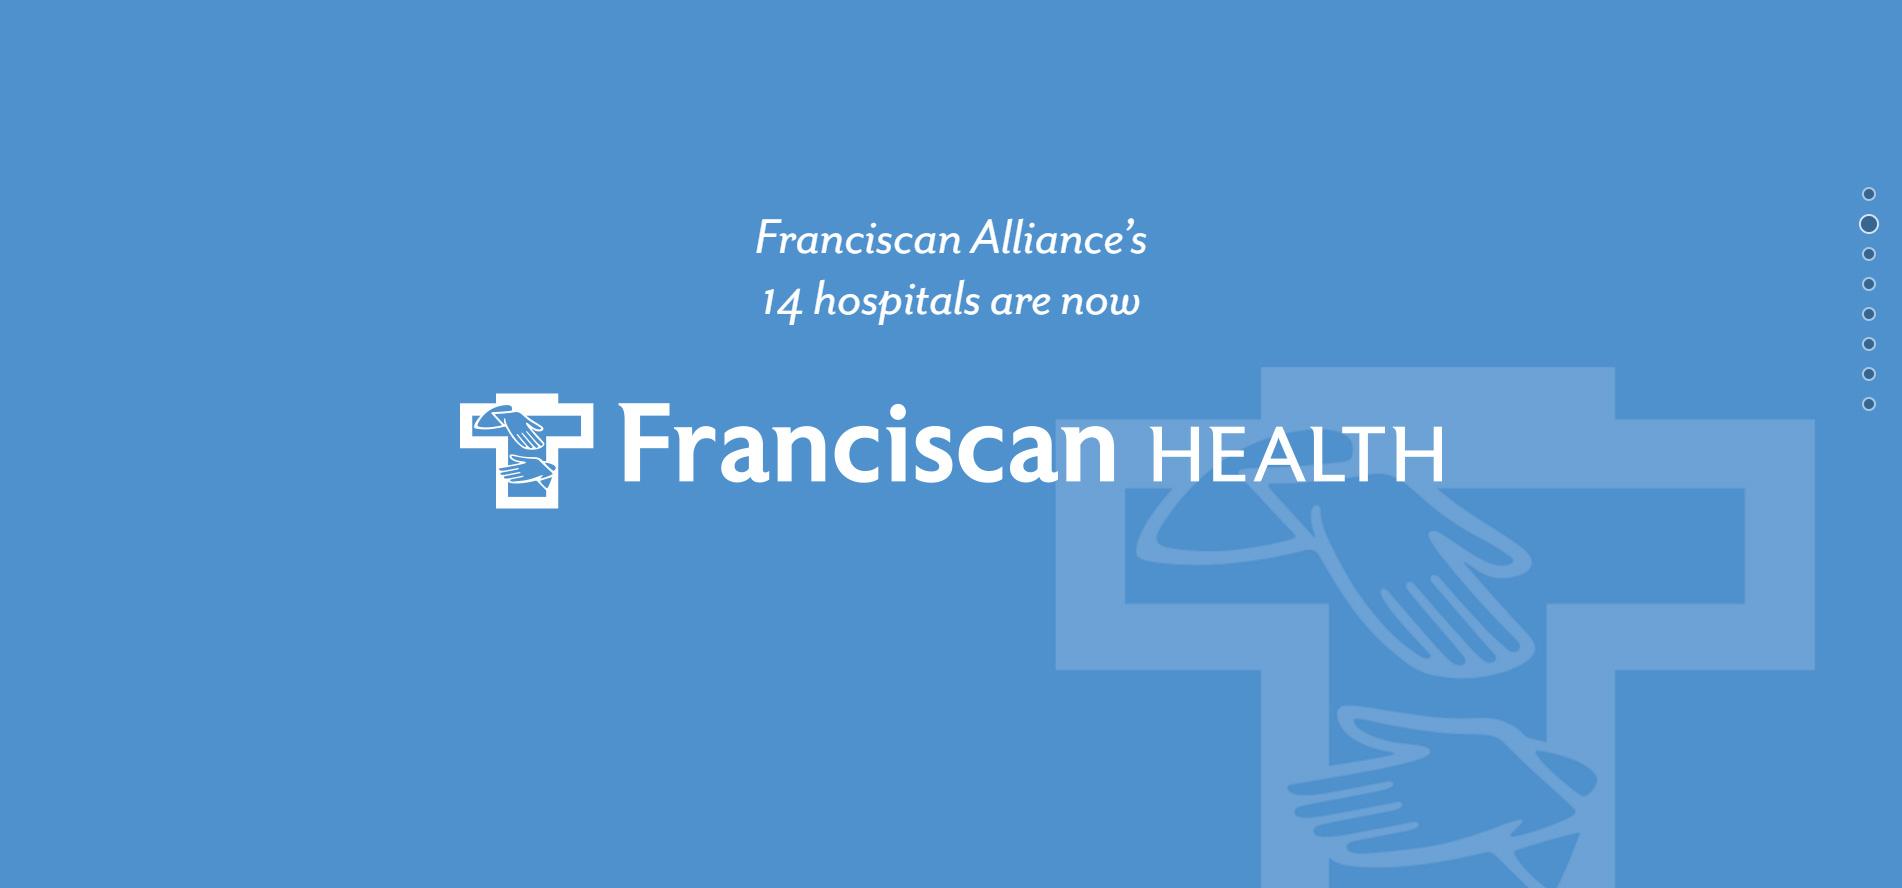 franciscan-health-logo